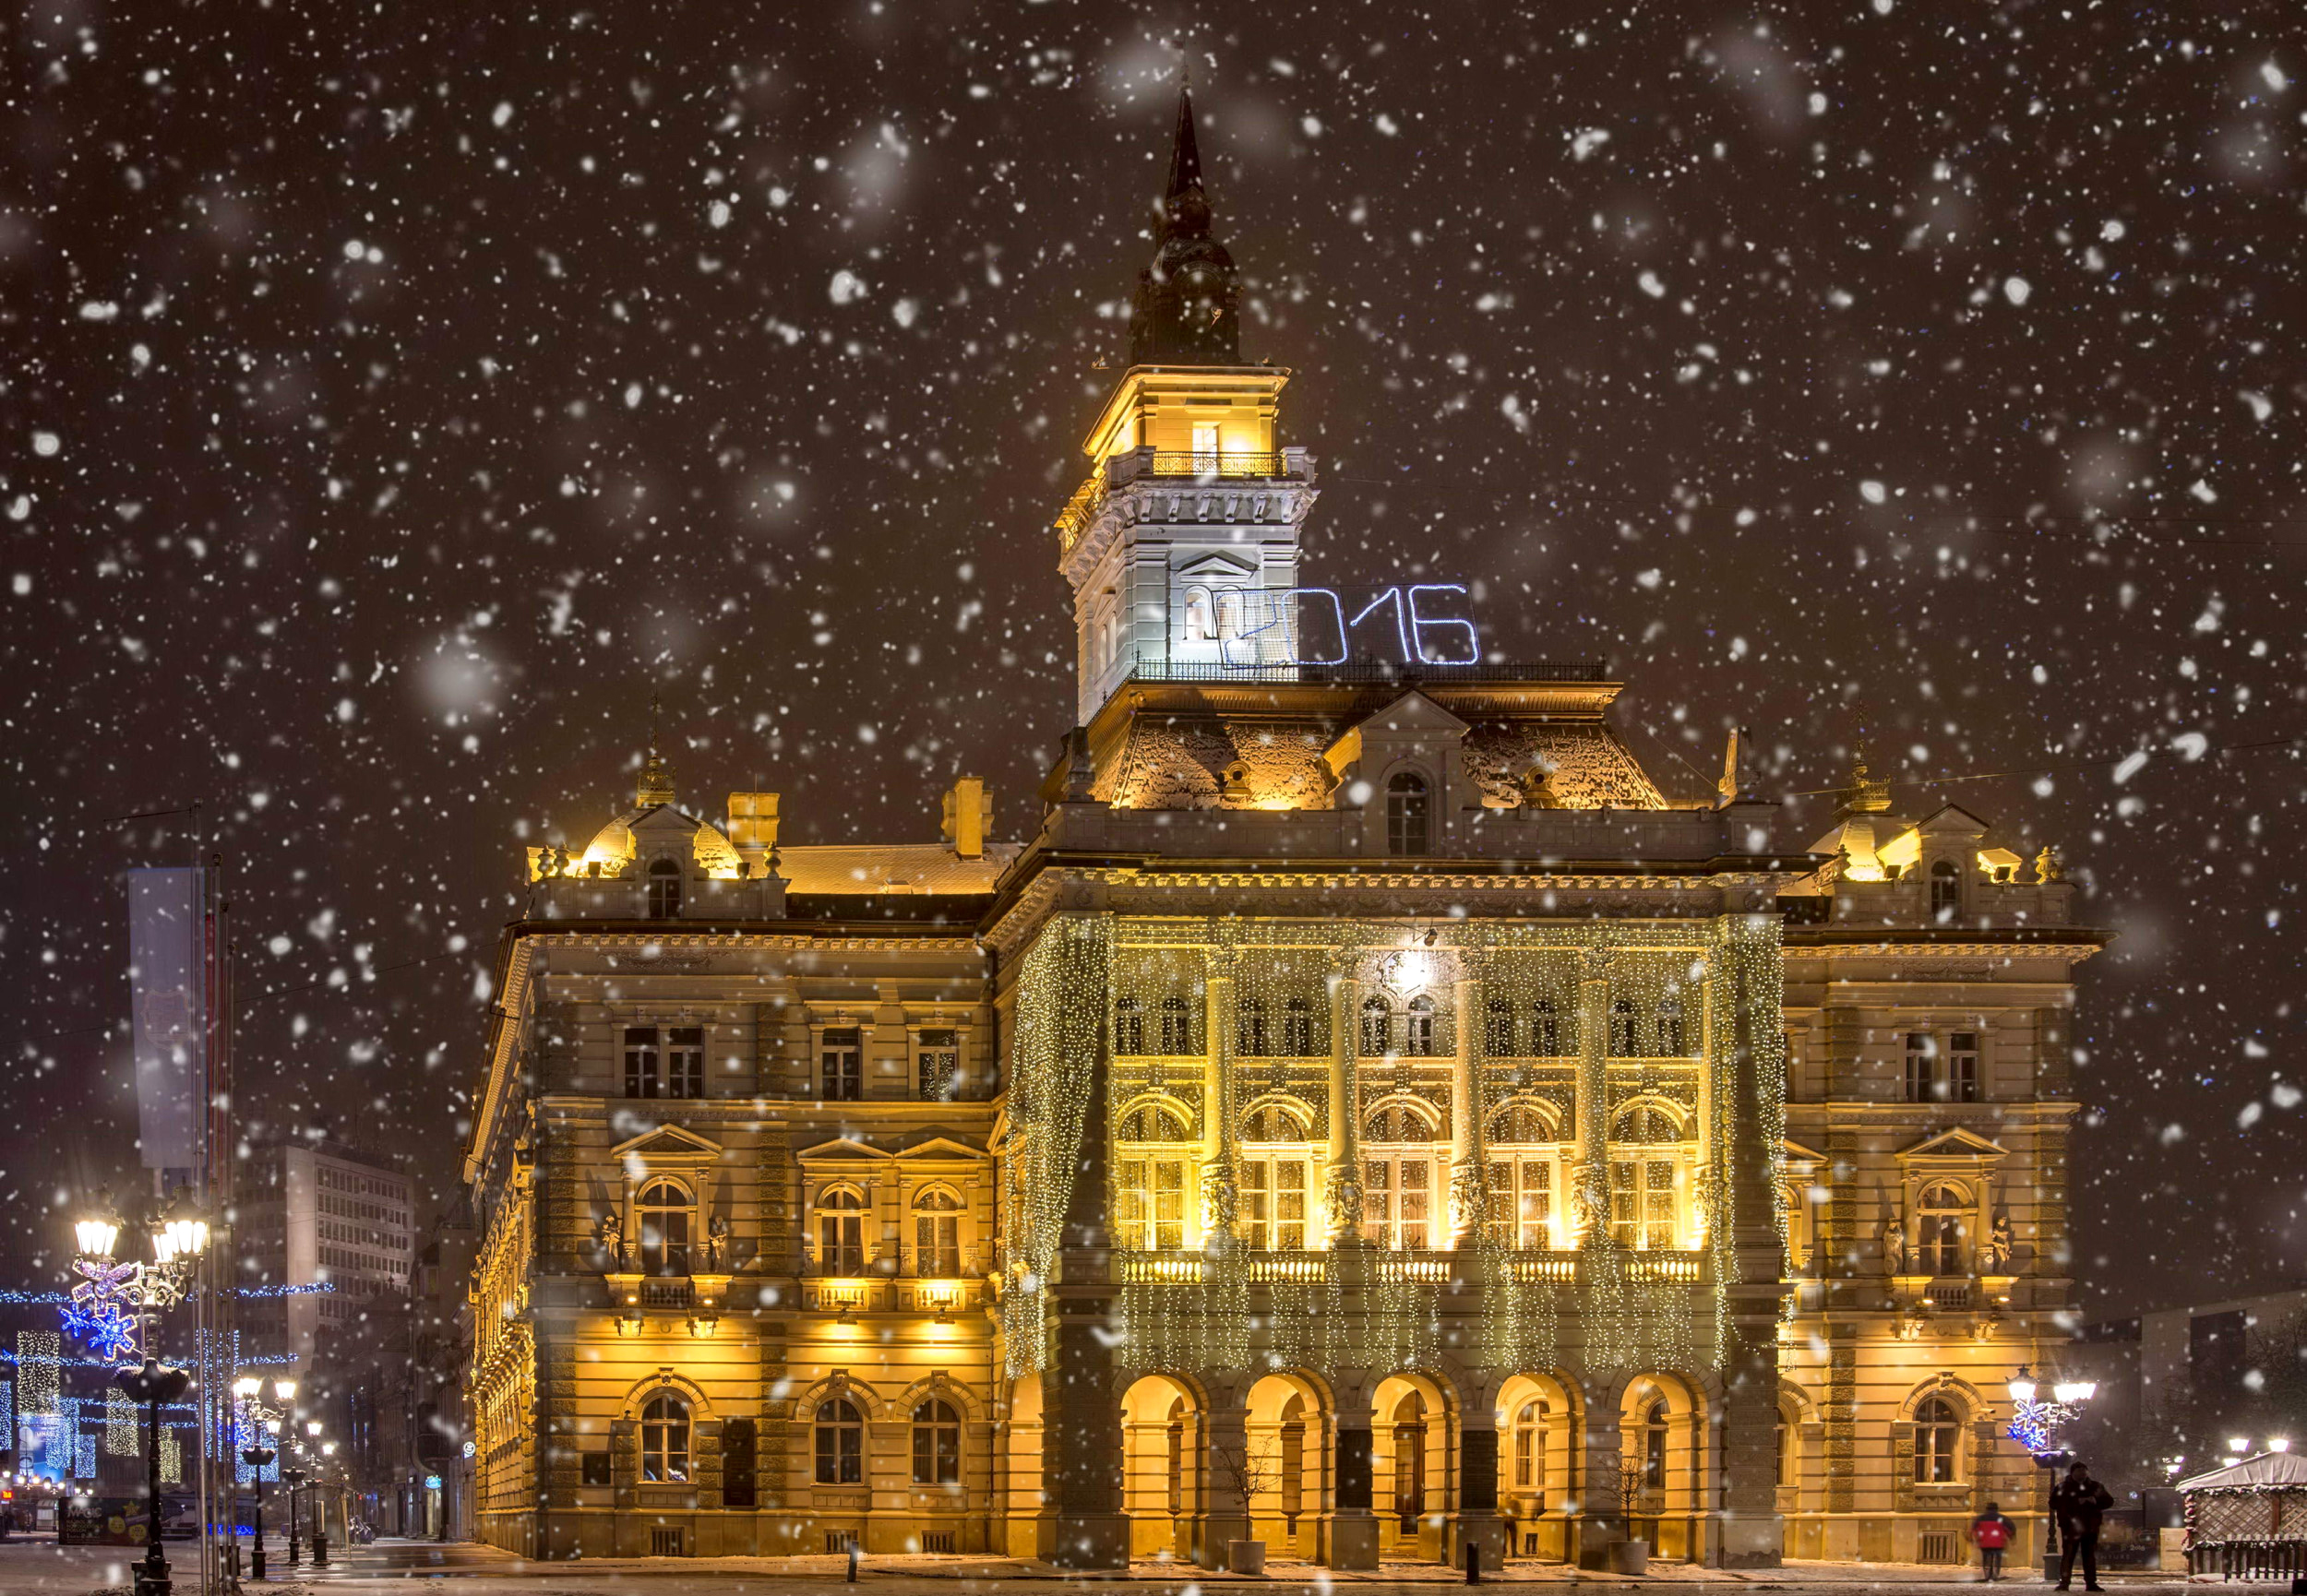 Snow Falling On City Of Novi Sad Serbia Full HD Wallpaper And